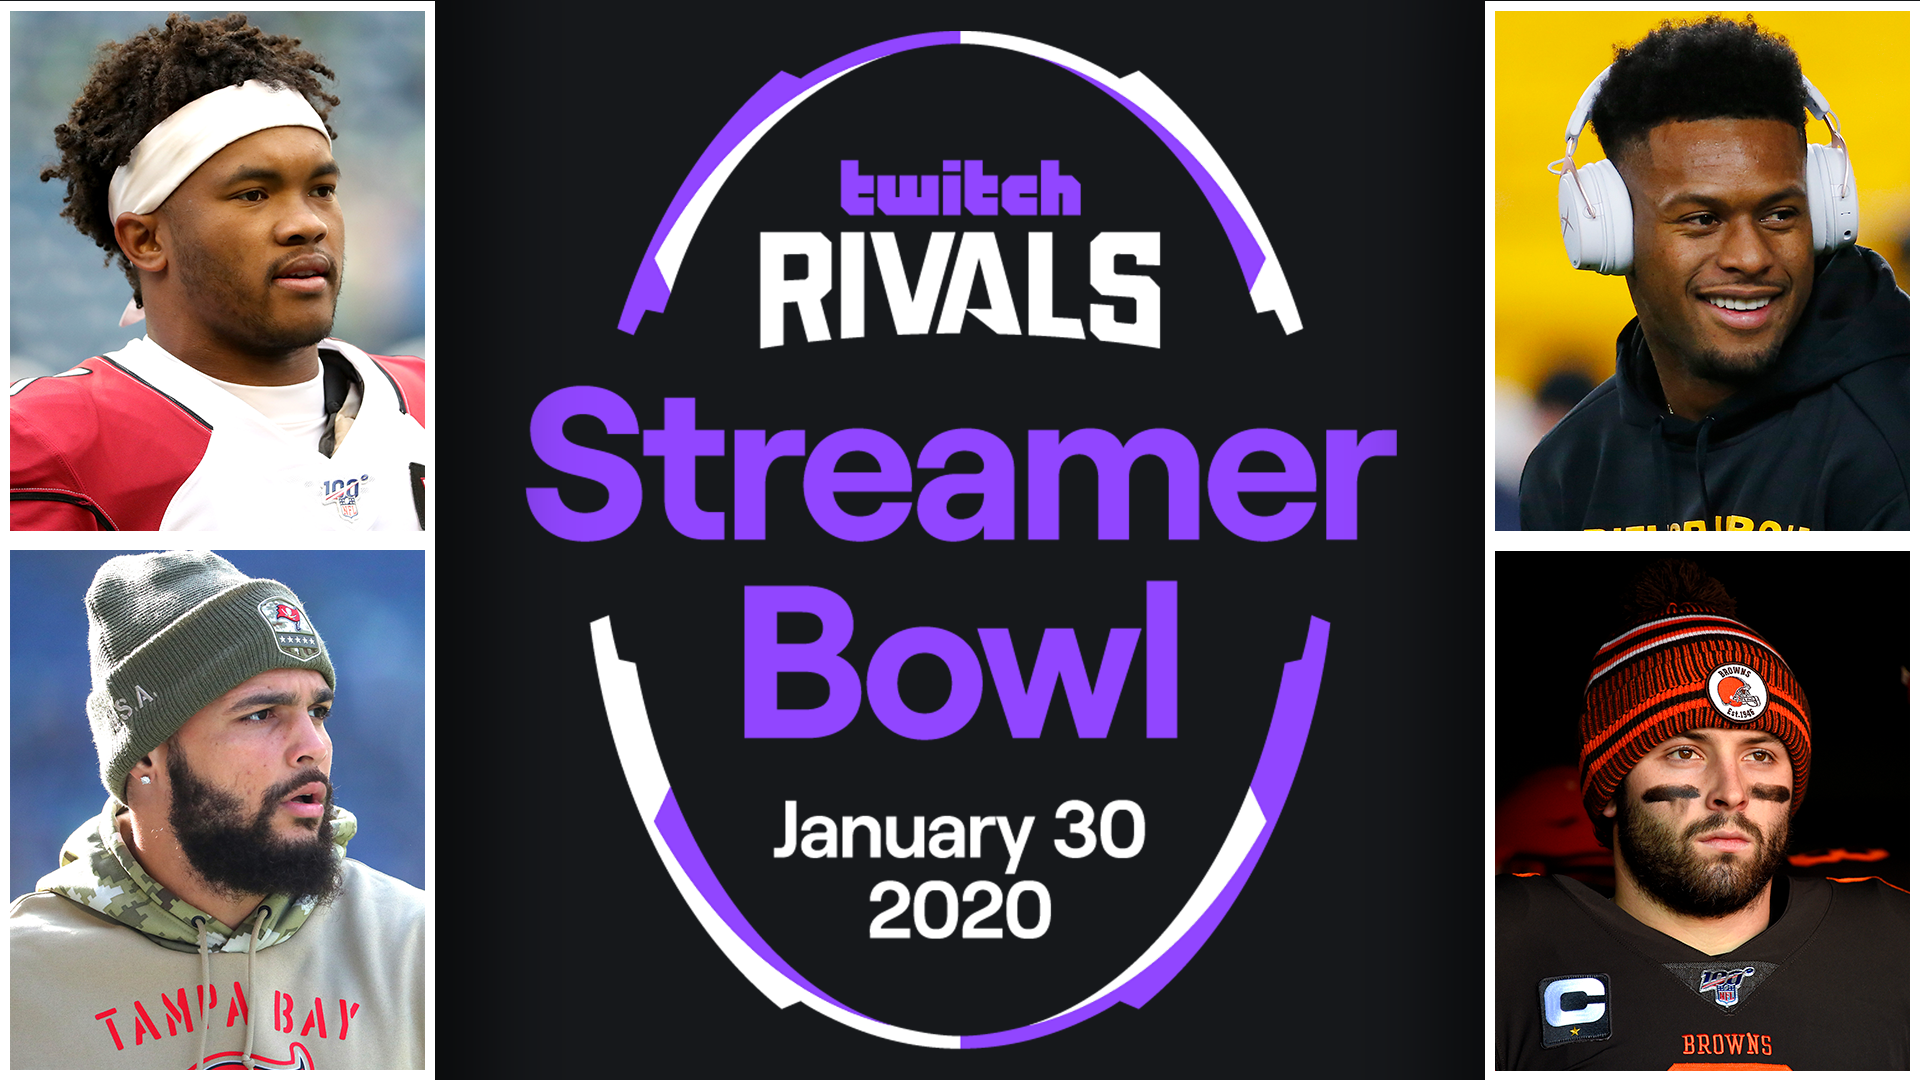 Twitch-rivals-streamer-bowl-ftr_e9c3hbue4opi1j55ynfv6v8ht